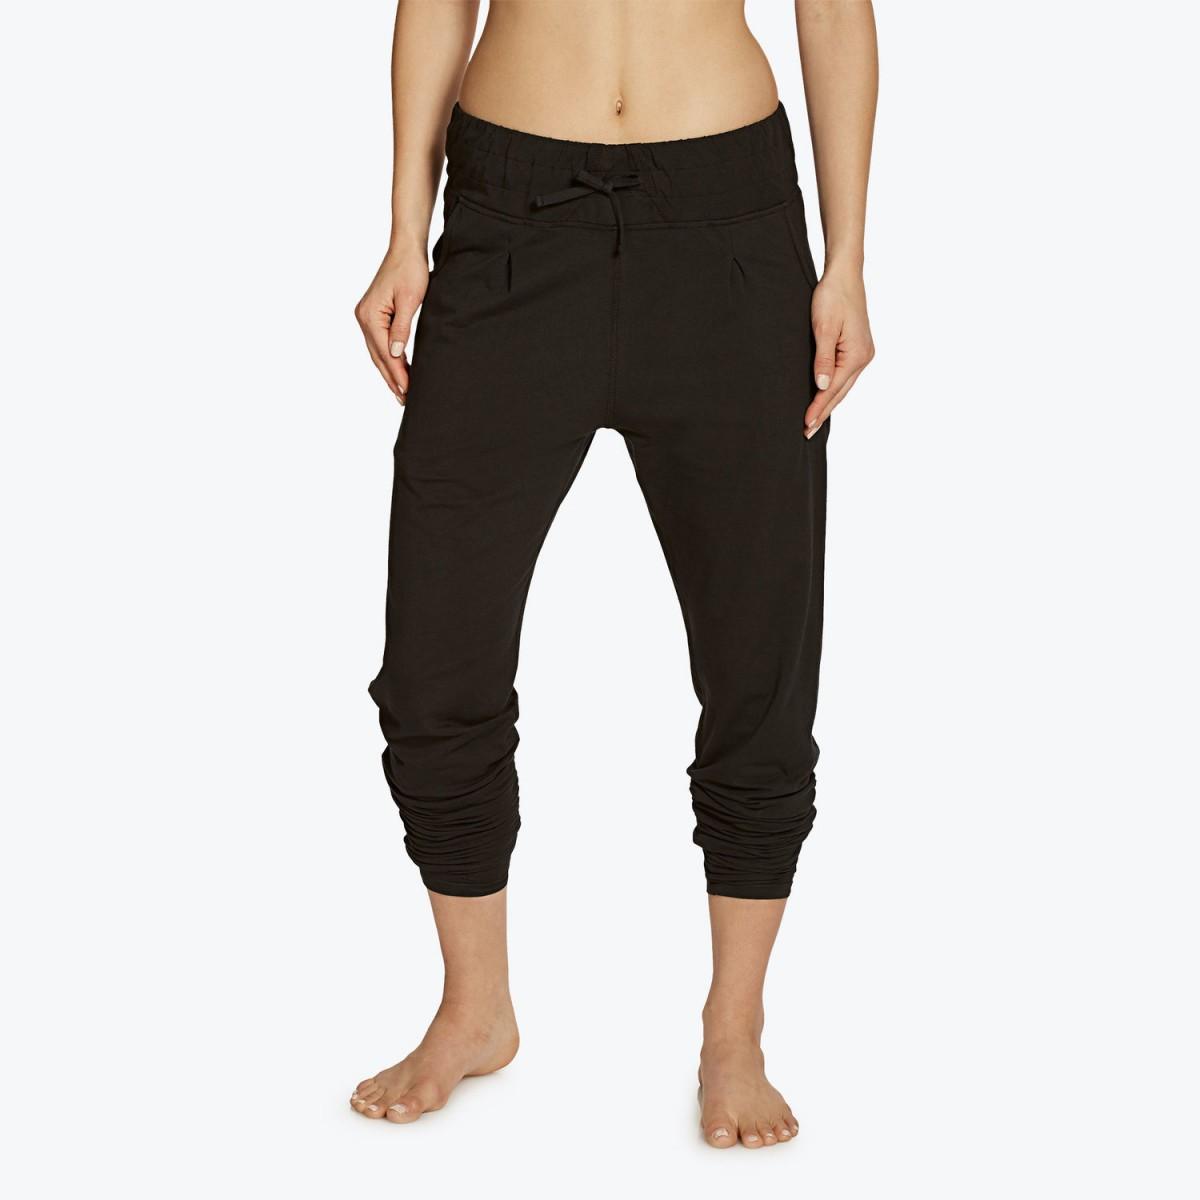 Gaiam Harem Yoga Leggings